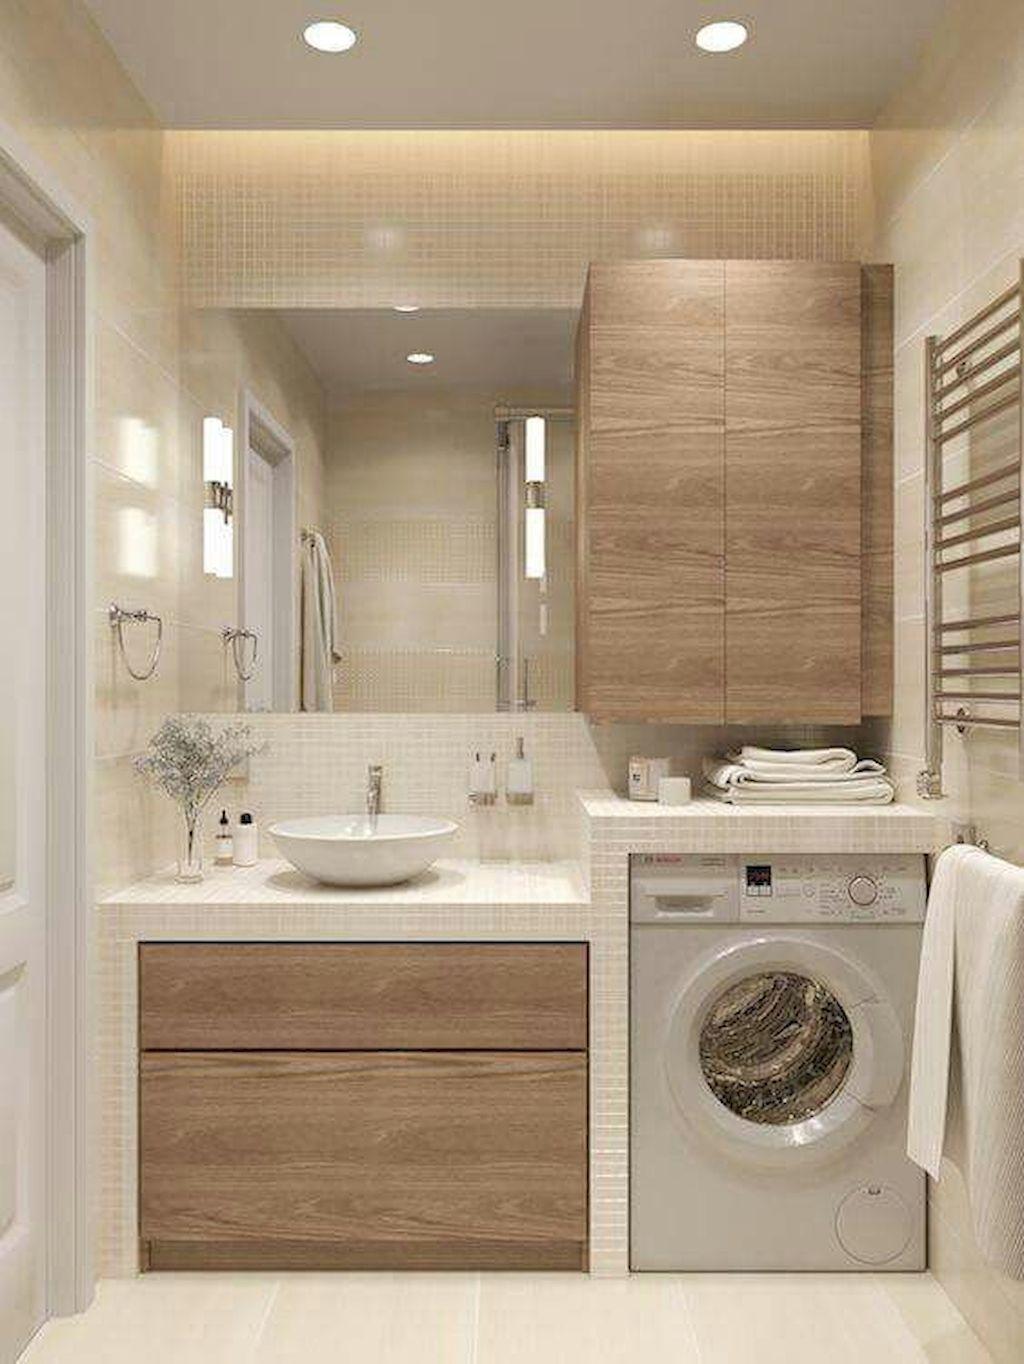 10 Beautiful Bathroom Vanity Ideas Images Gallery Bathroom